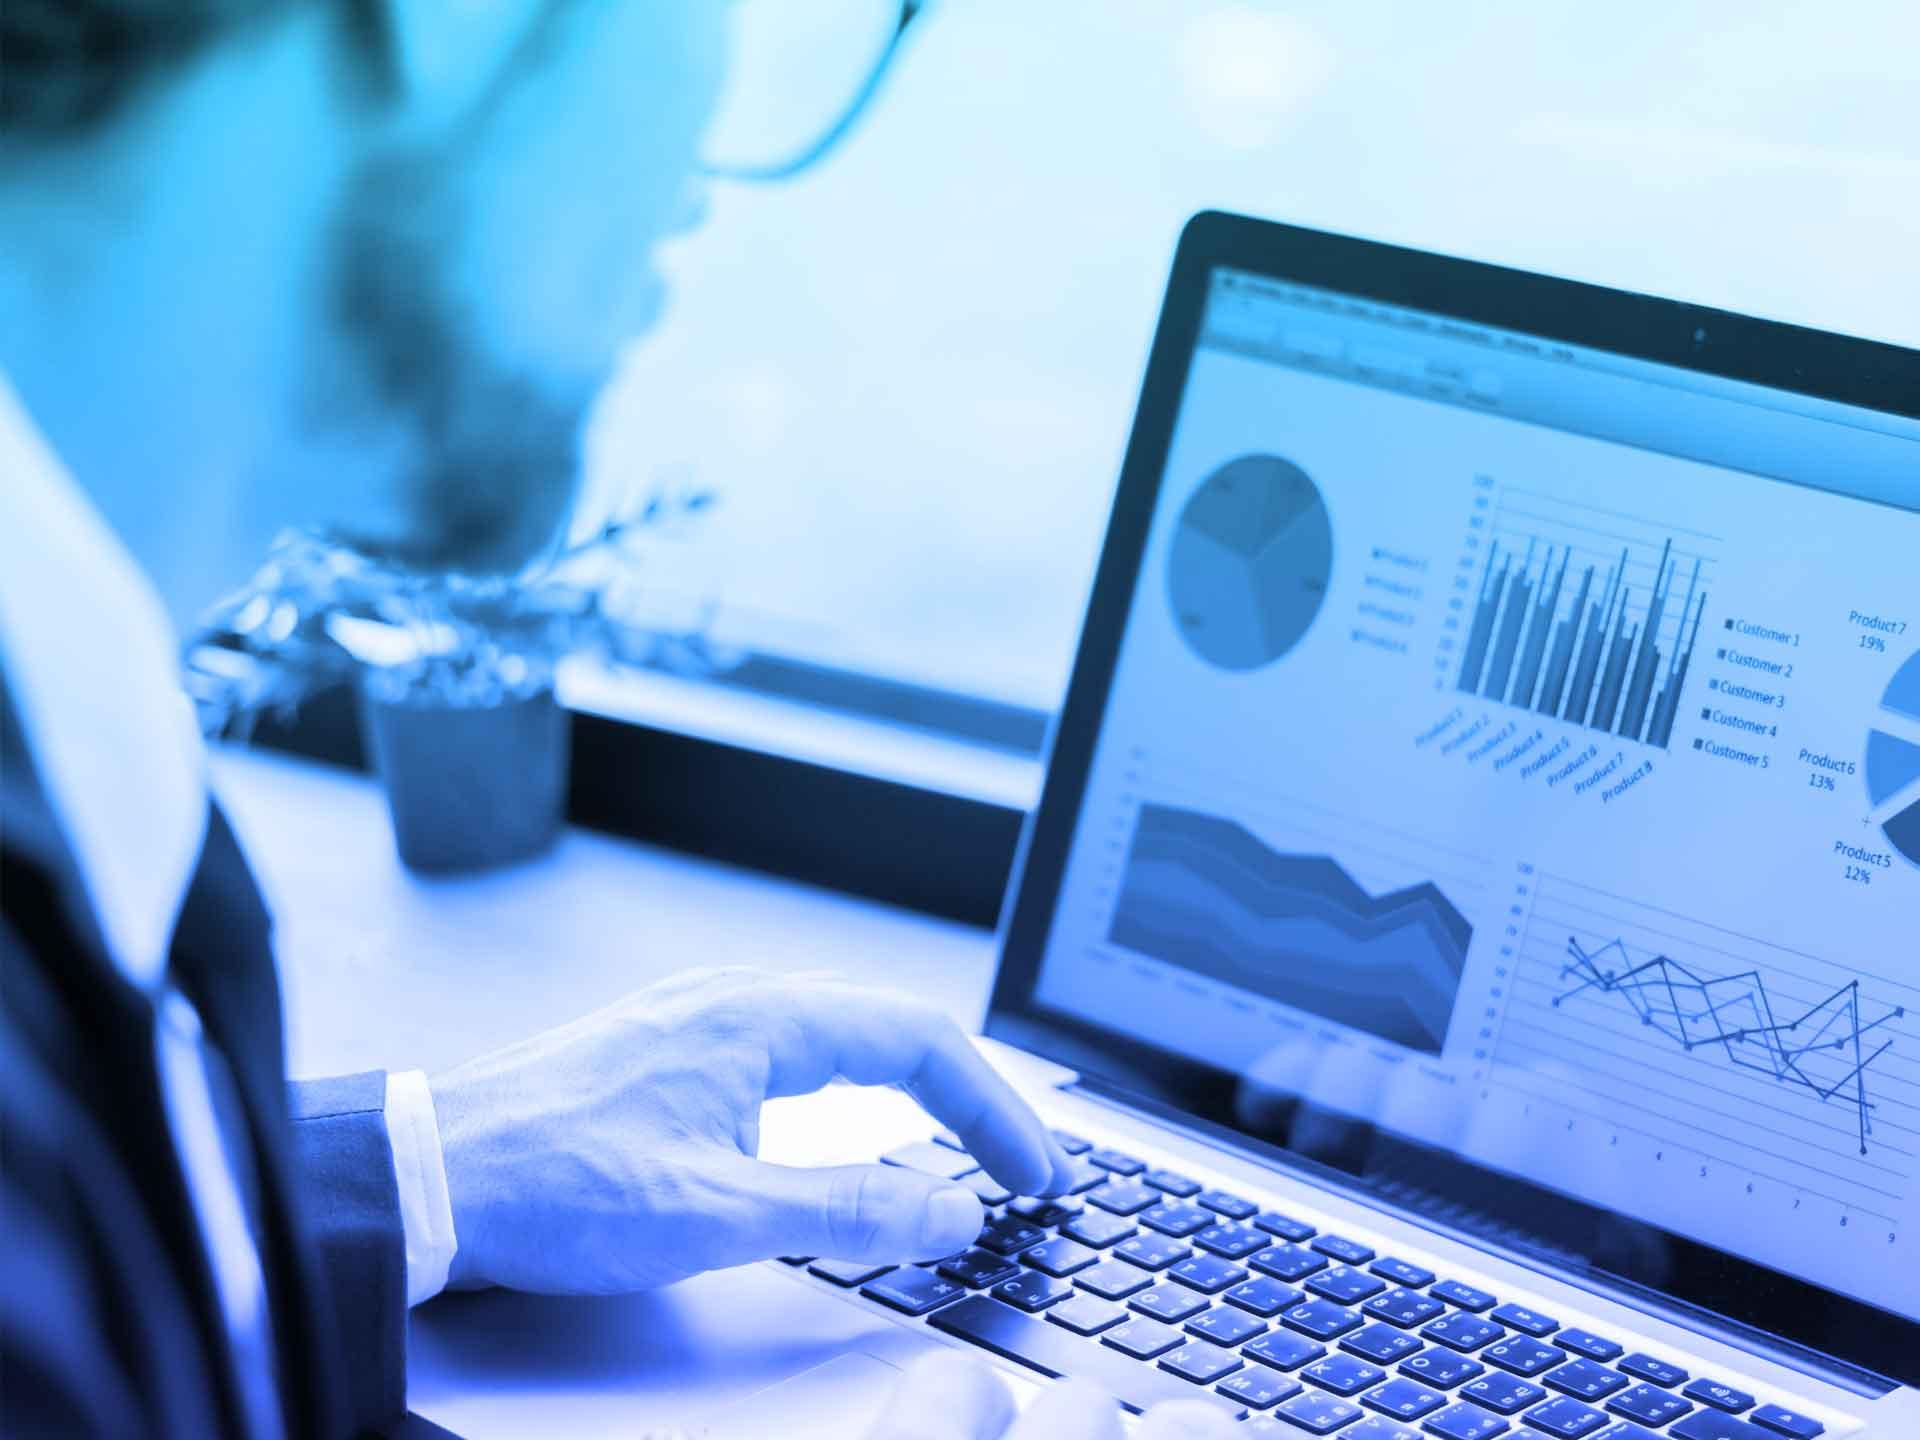 Microsoft Dynamics 365 Customer Service services intelligence